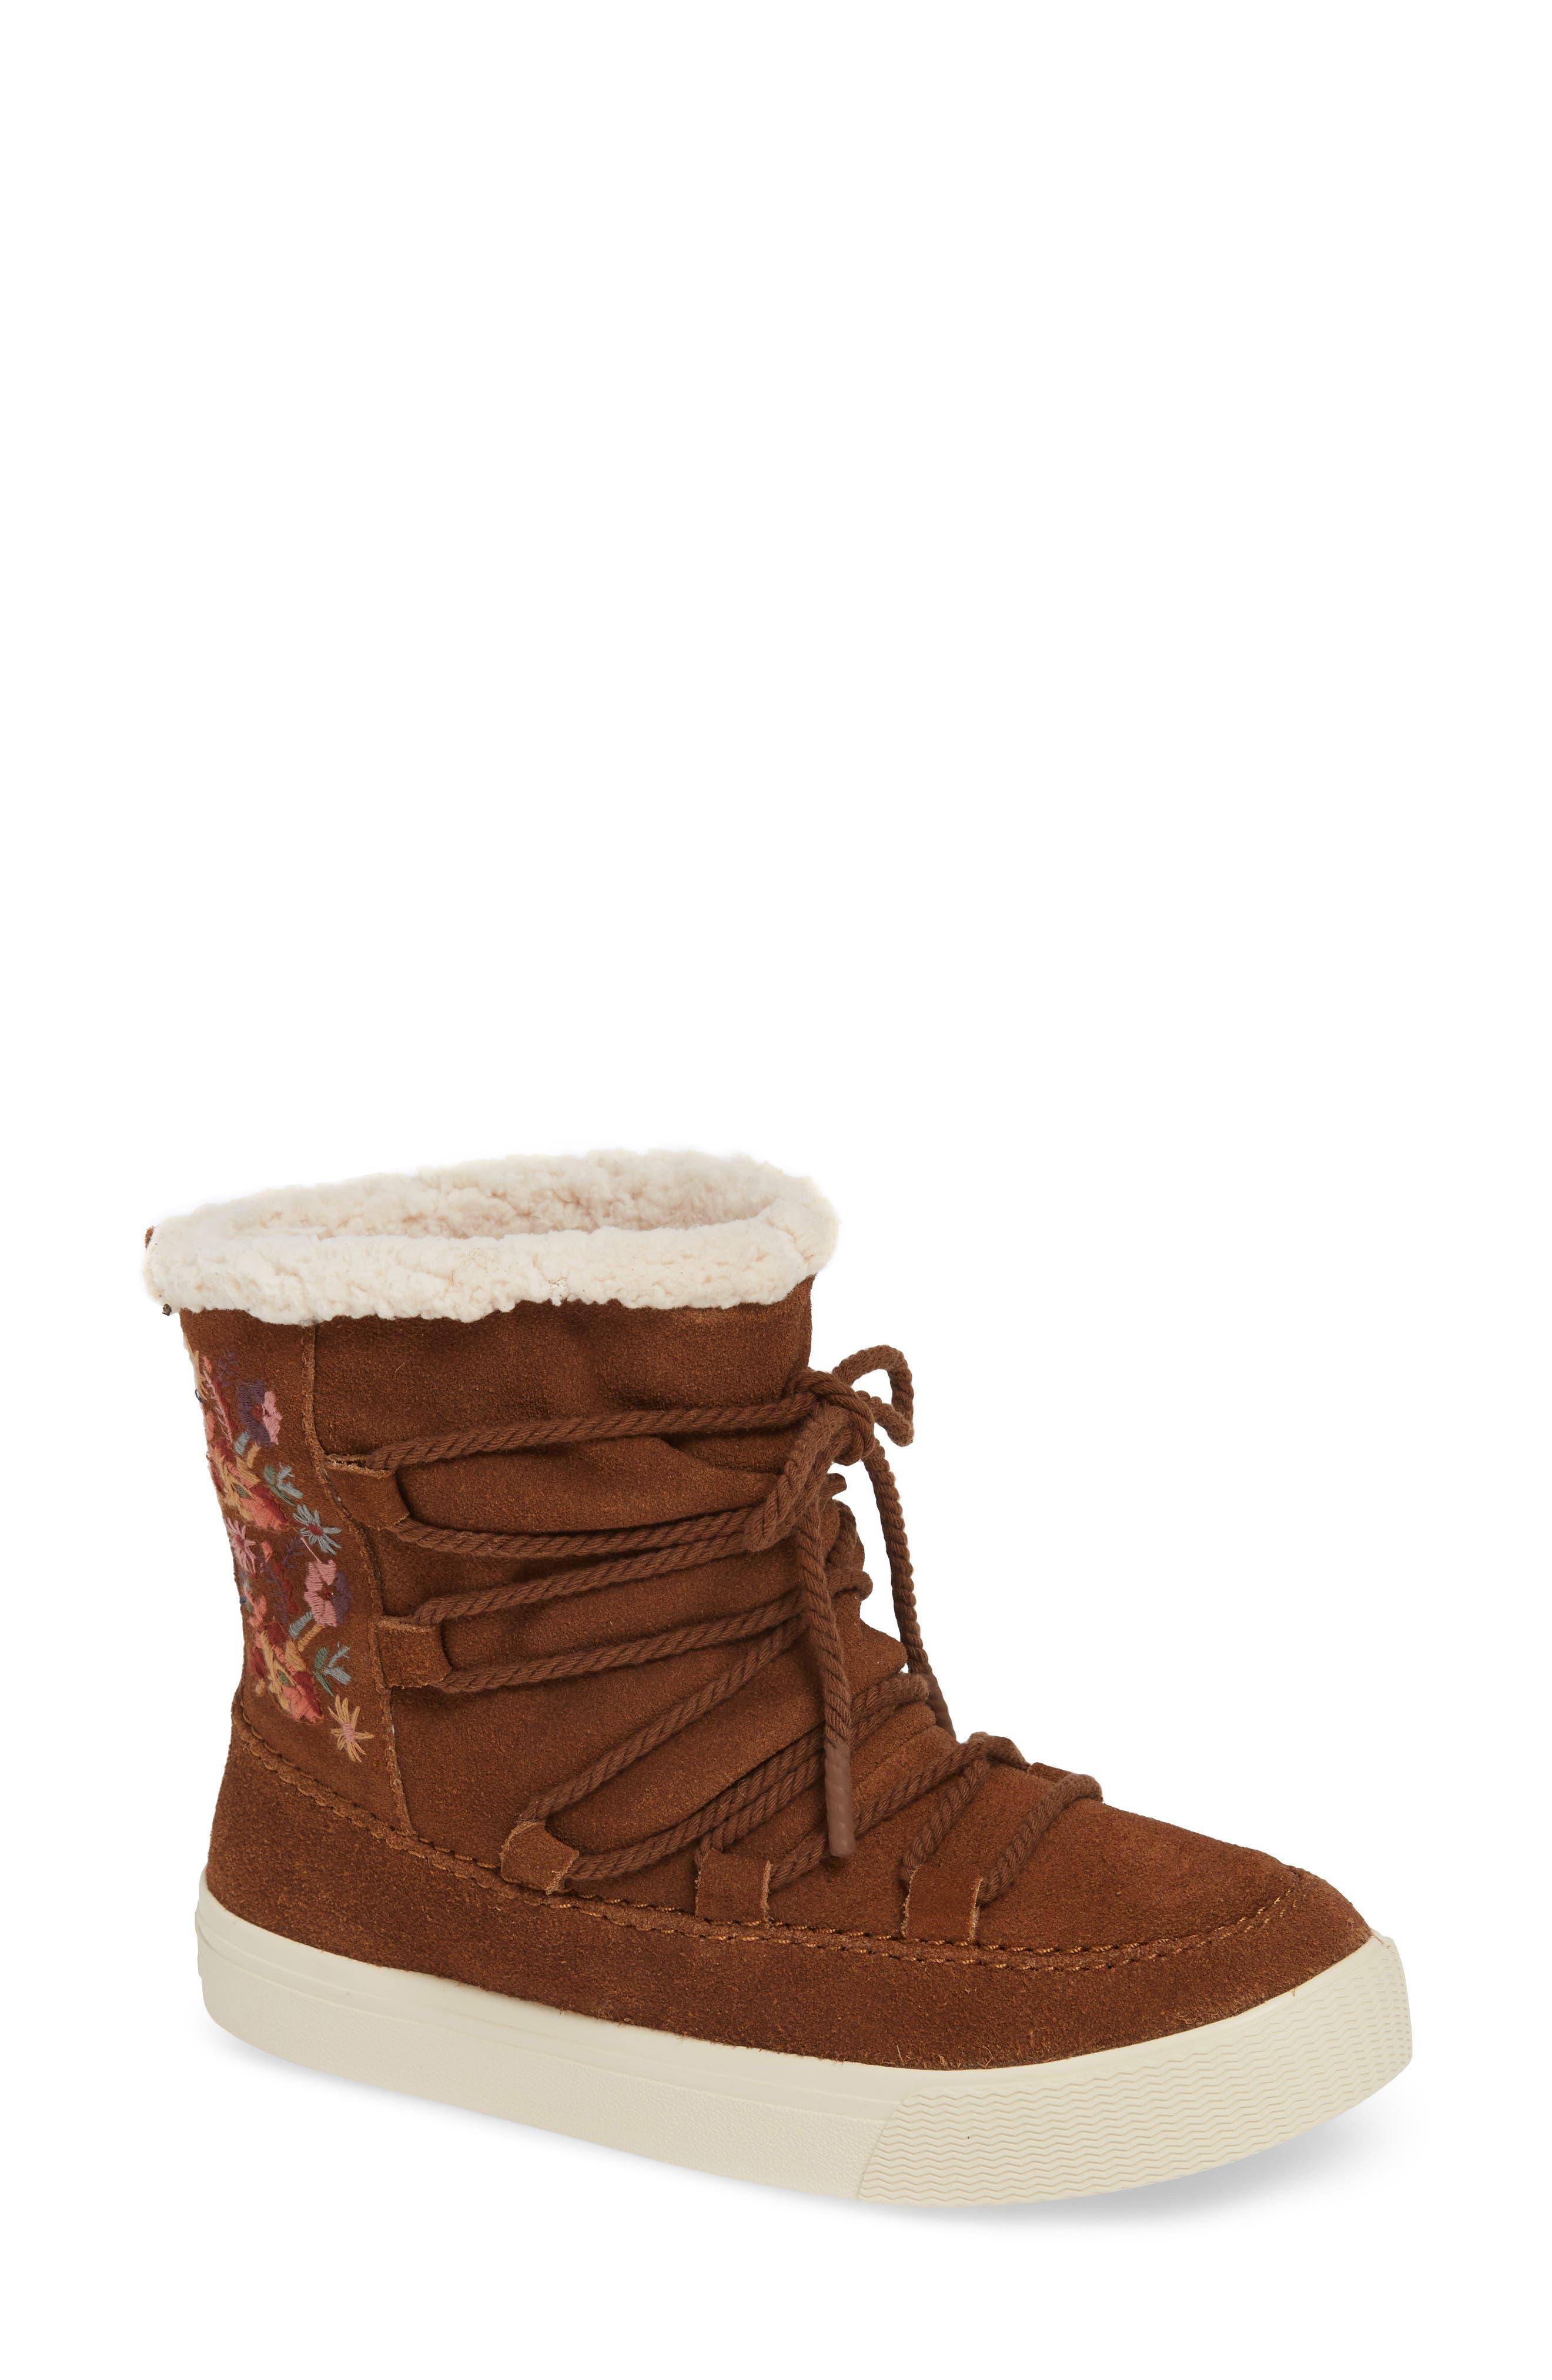 Toms Alpine Faux Fur Lined Bootie, Brown